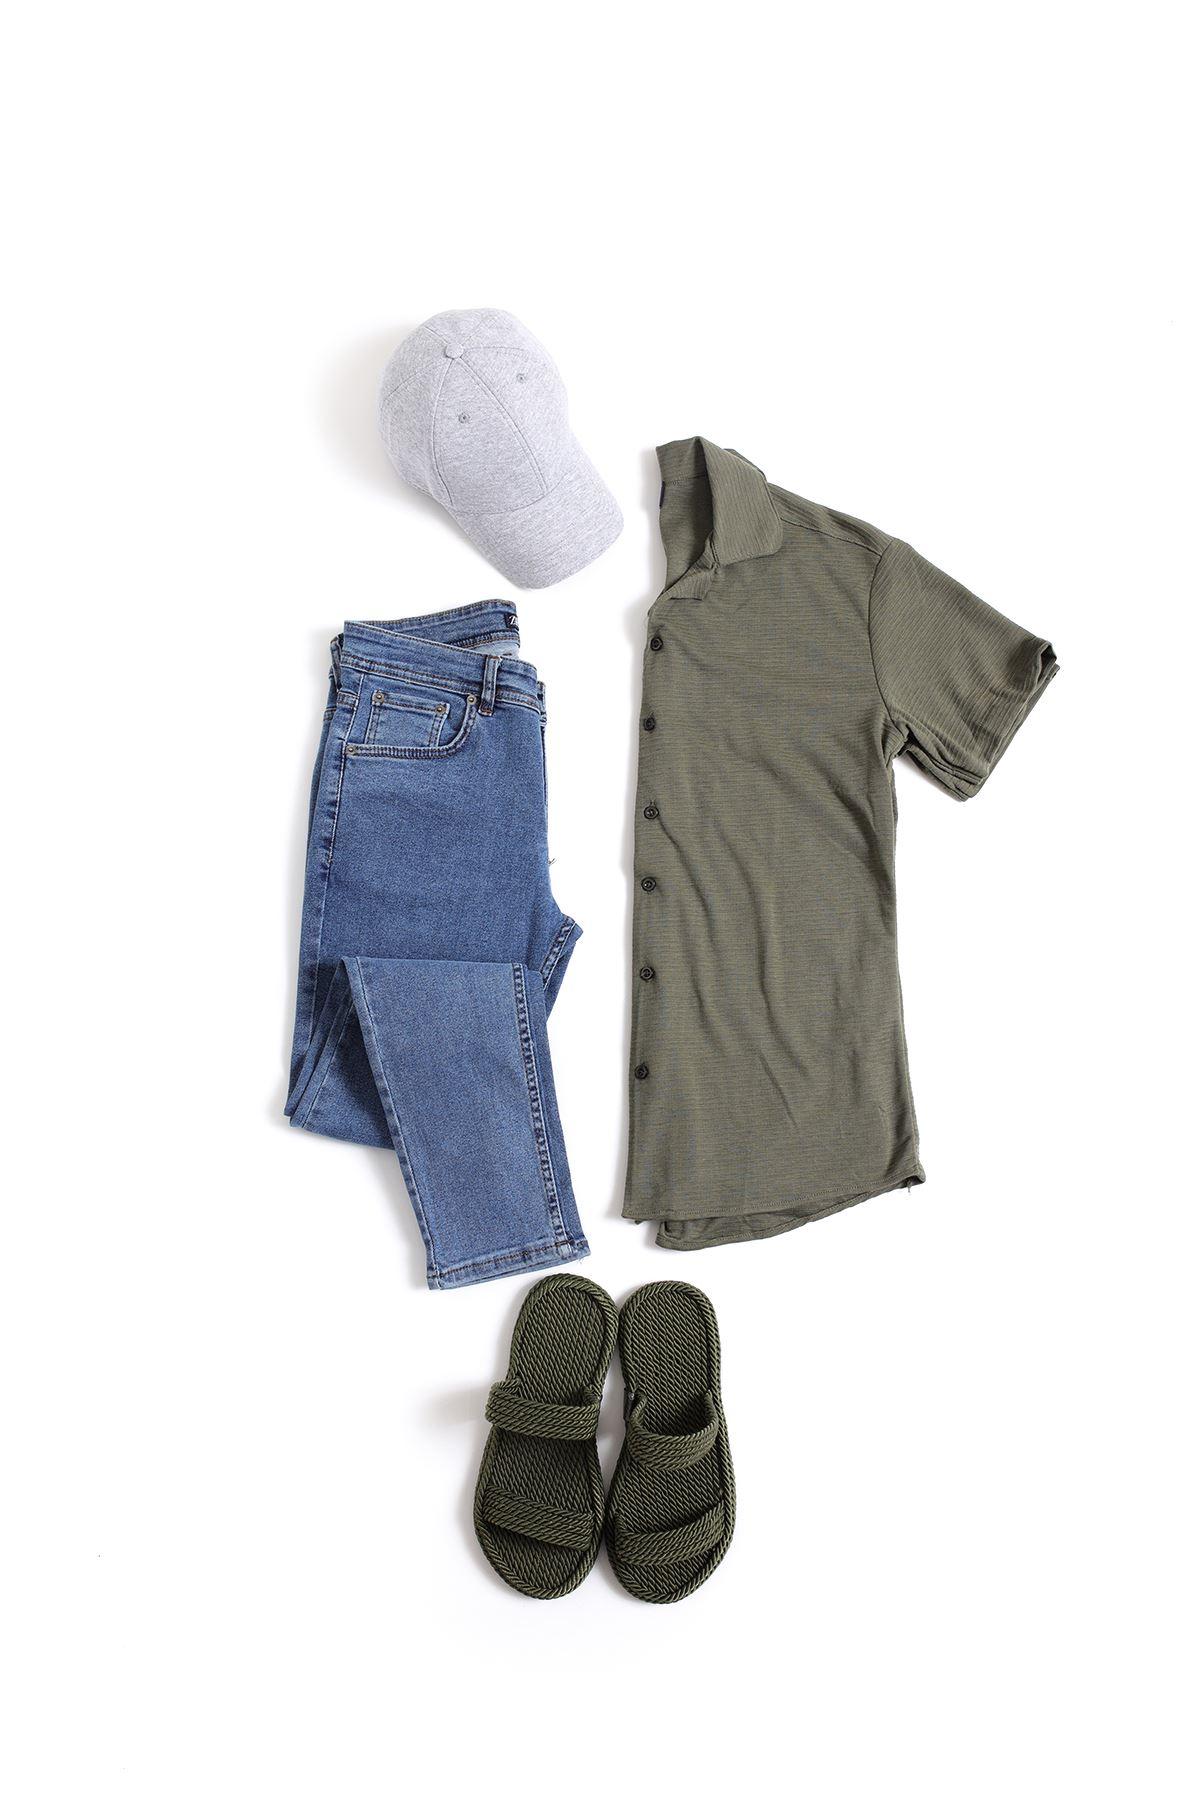 Koyu Yeşil Triko Gömlek Mavi Skinny Kot Kombin